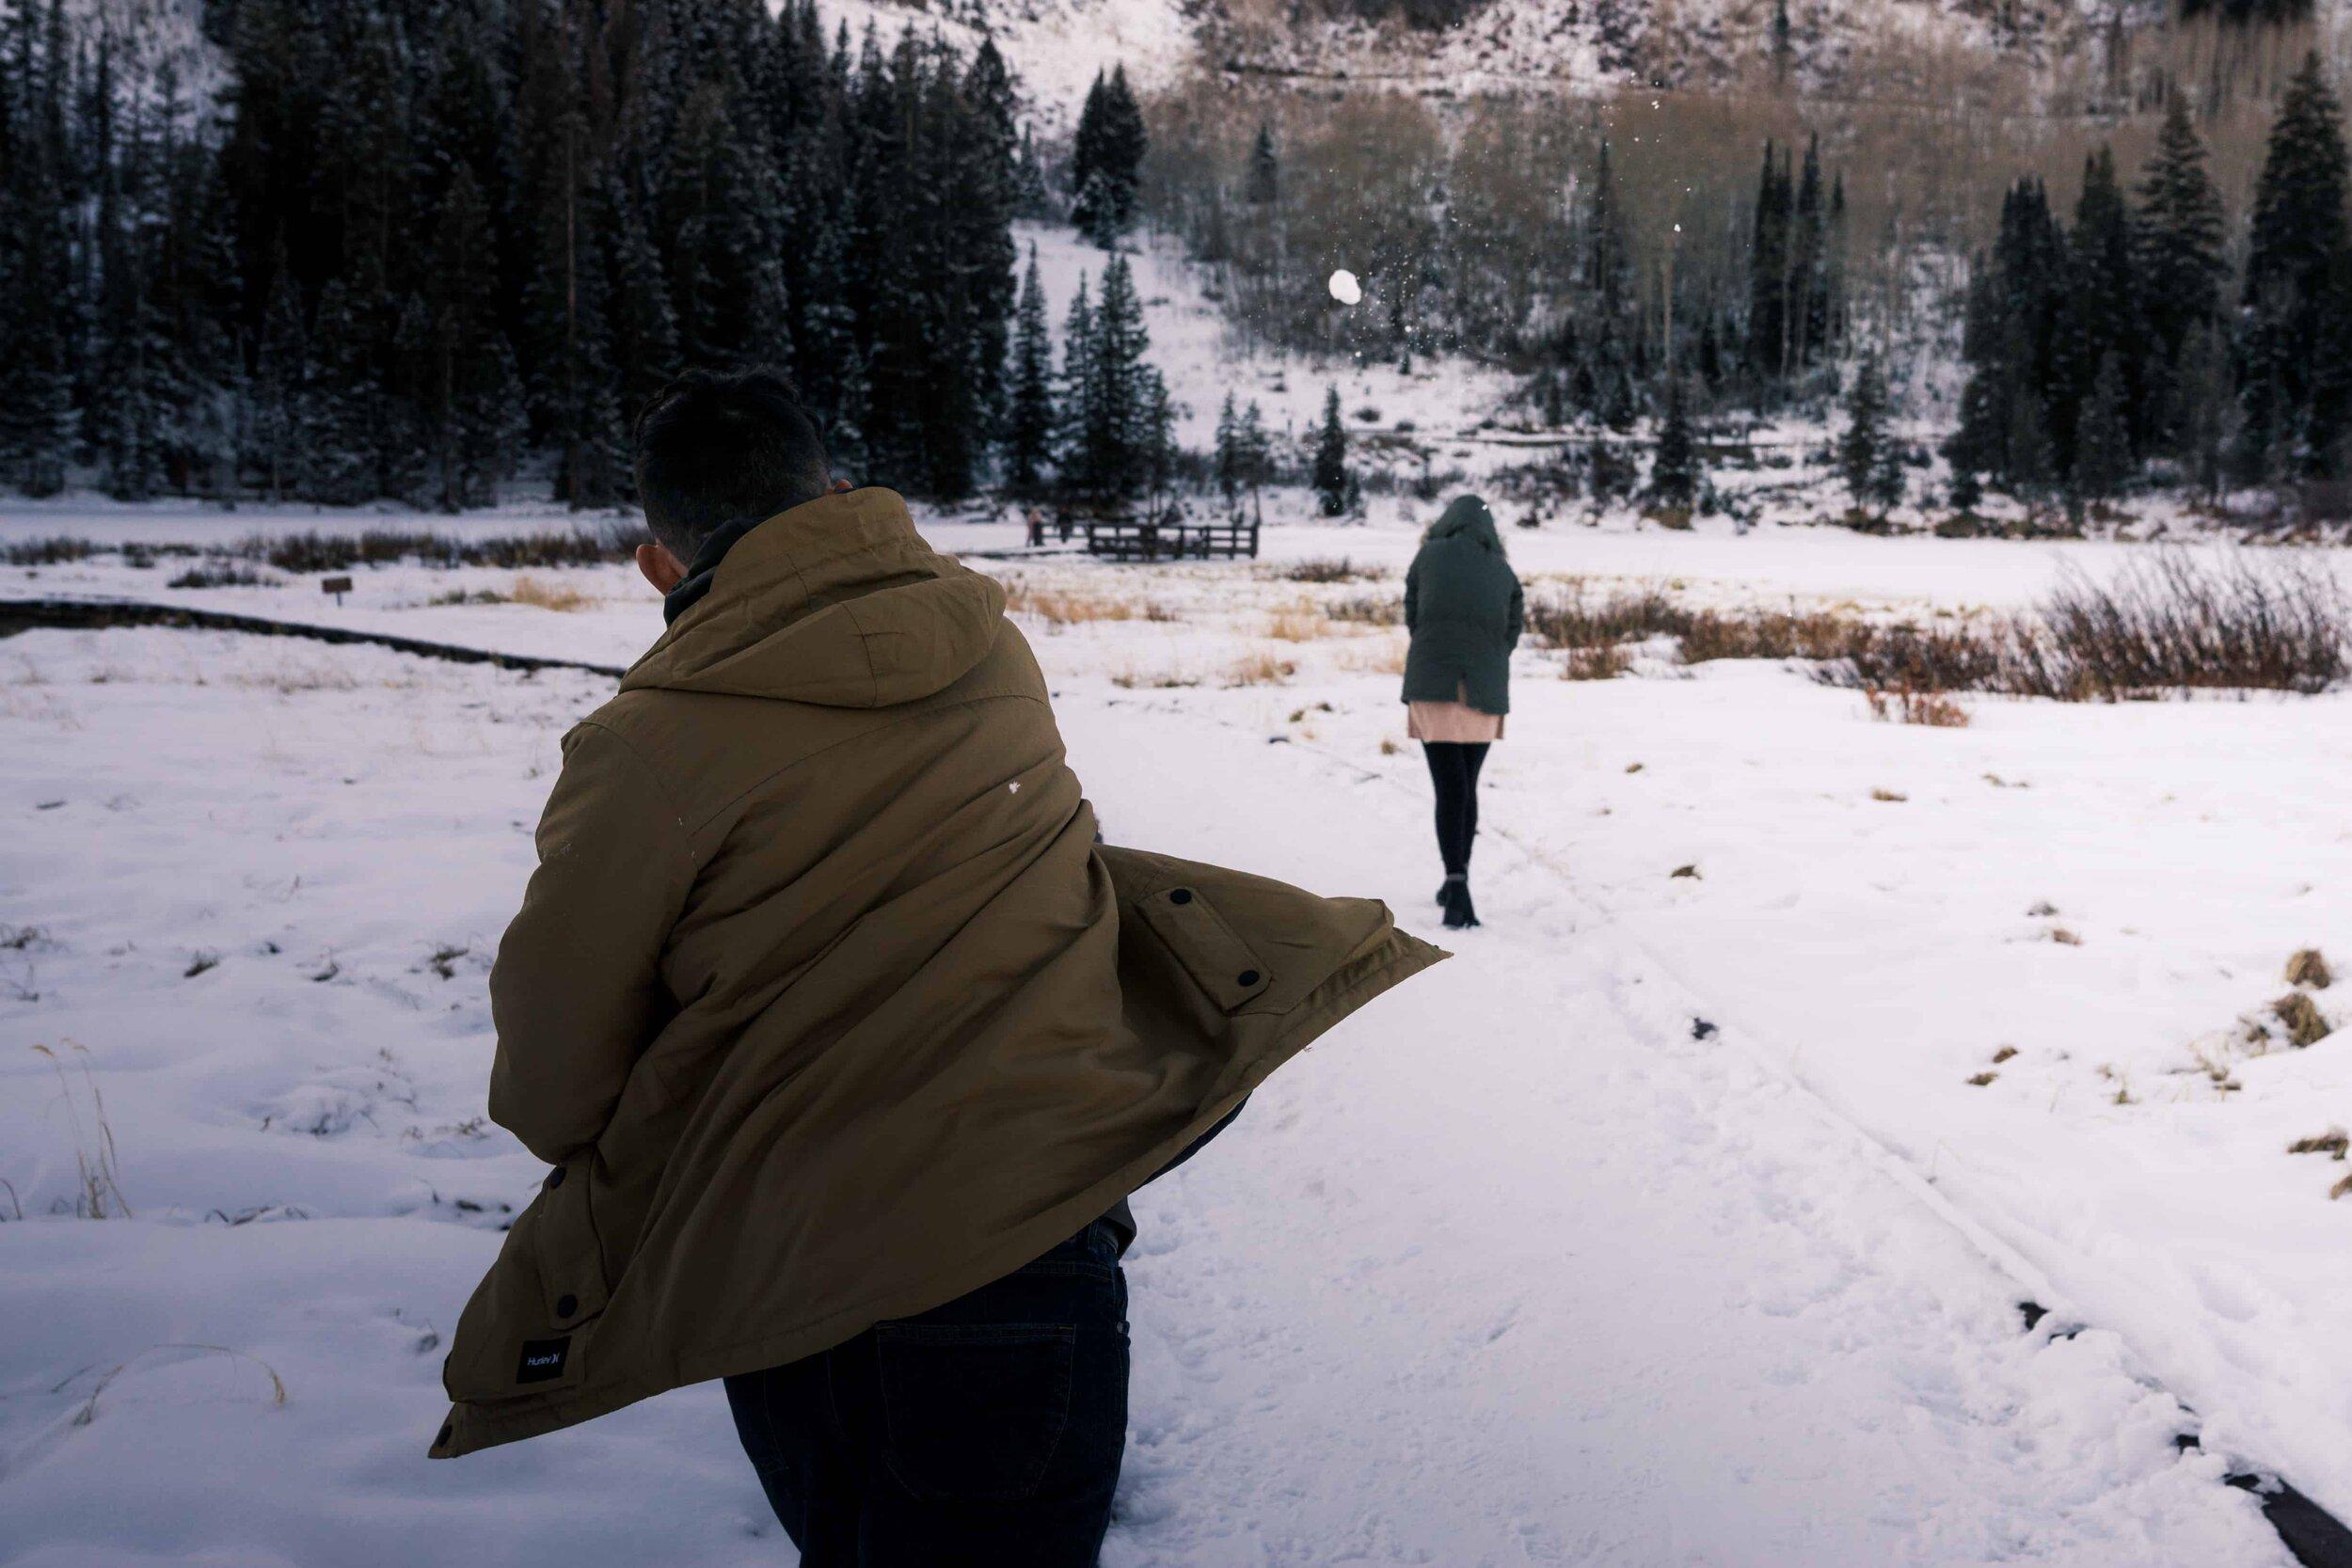 Angel and Kailey Utah Engagement adventure photoshoot